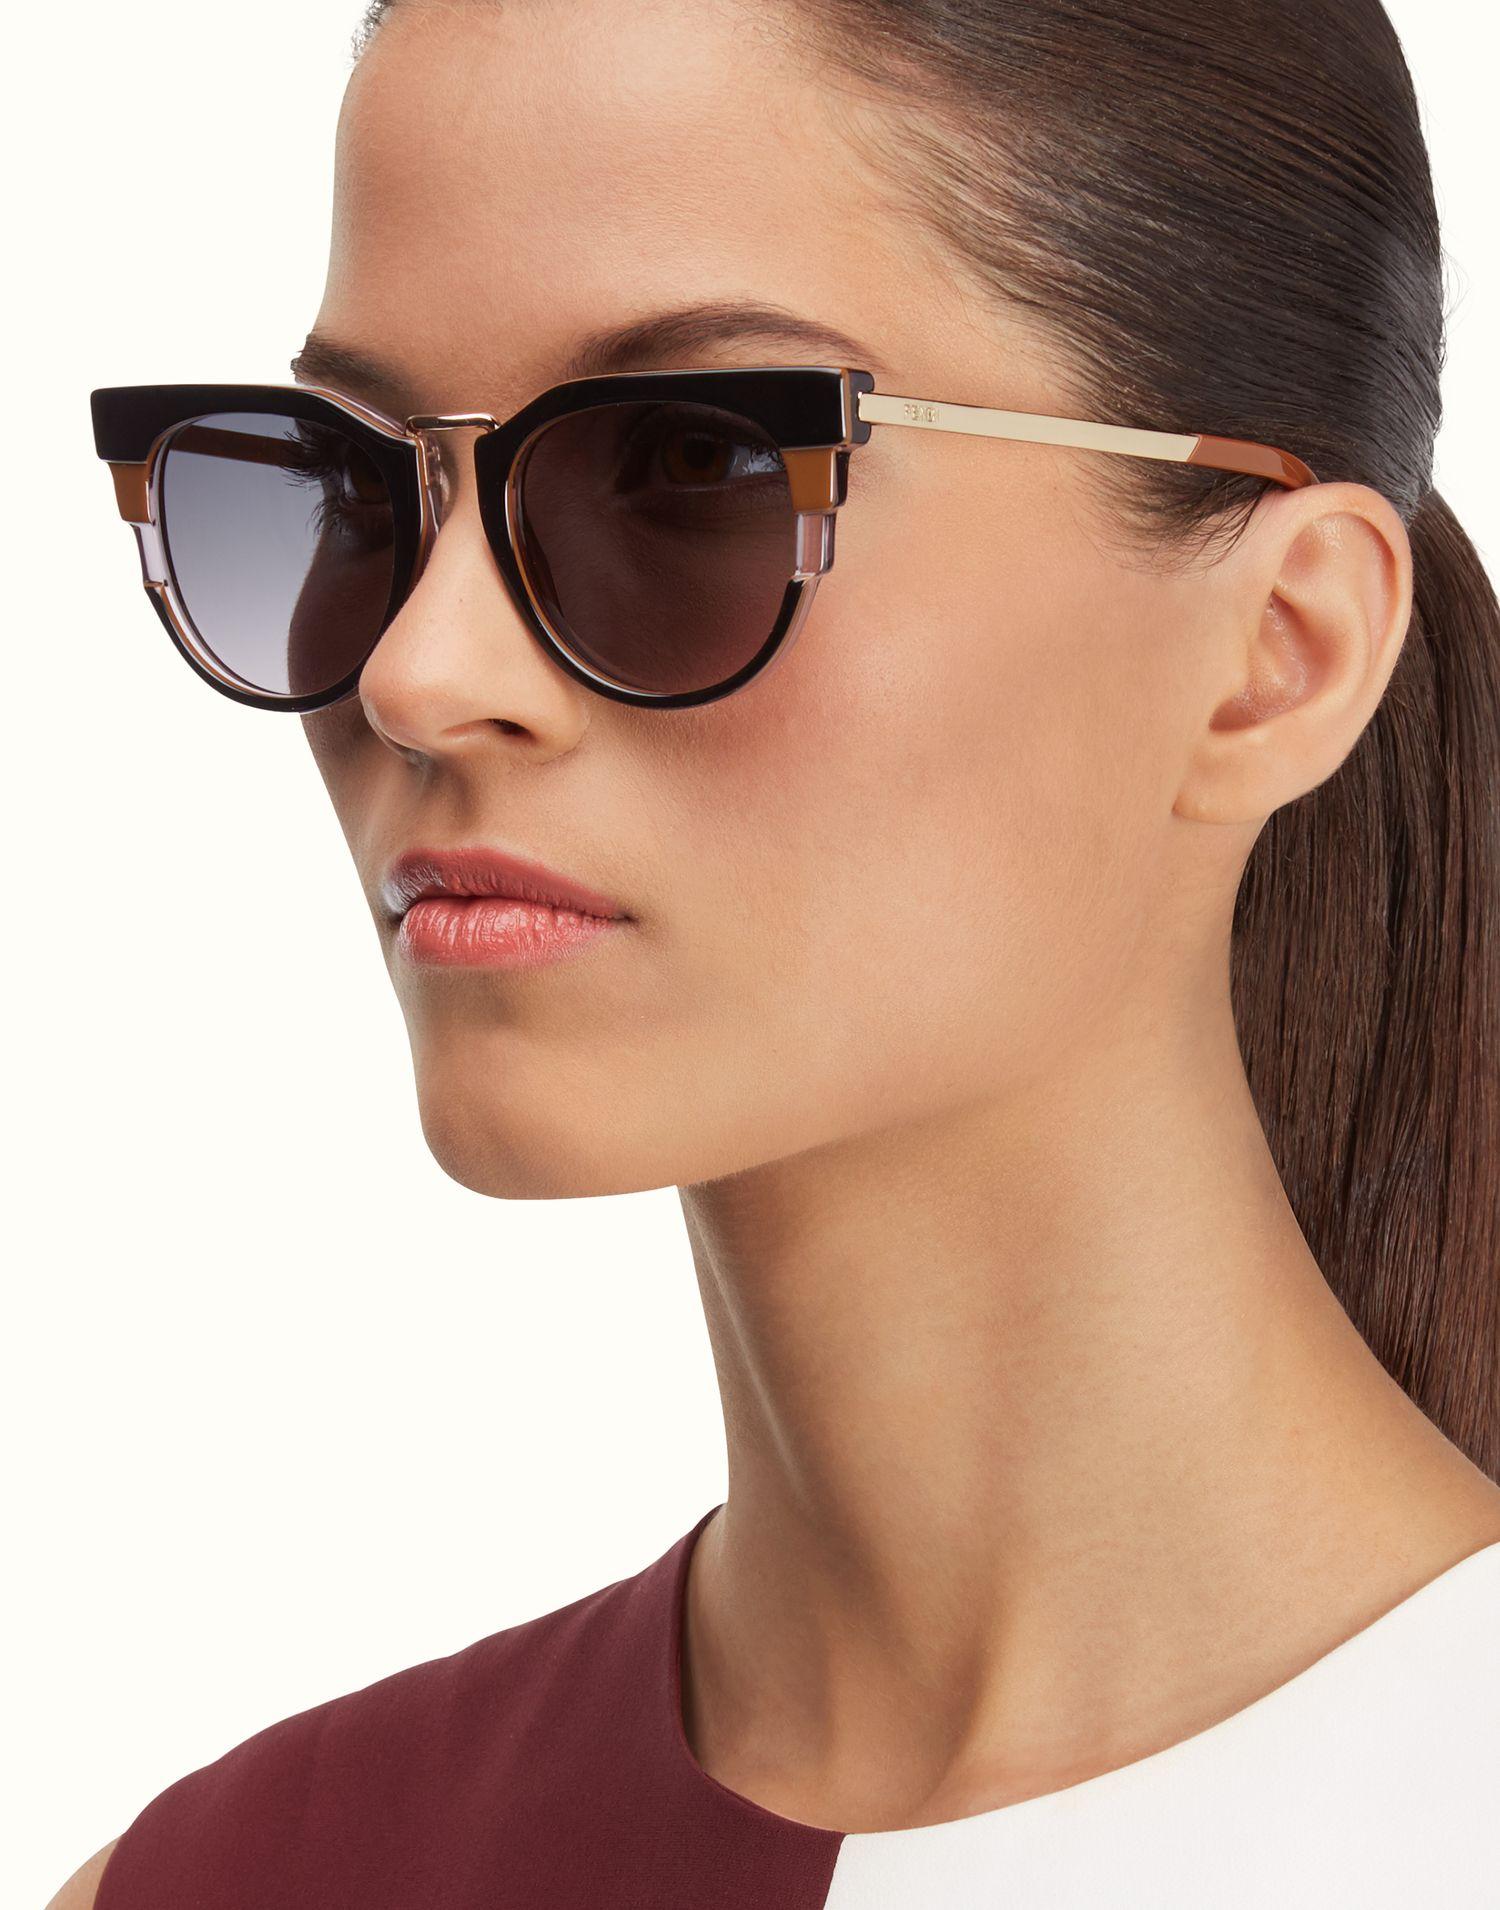 FENDI | METROPOLIS Tricolour sunglasses | Fendi sunglasses ...